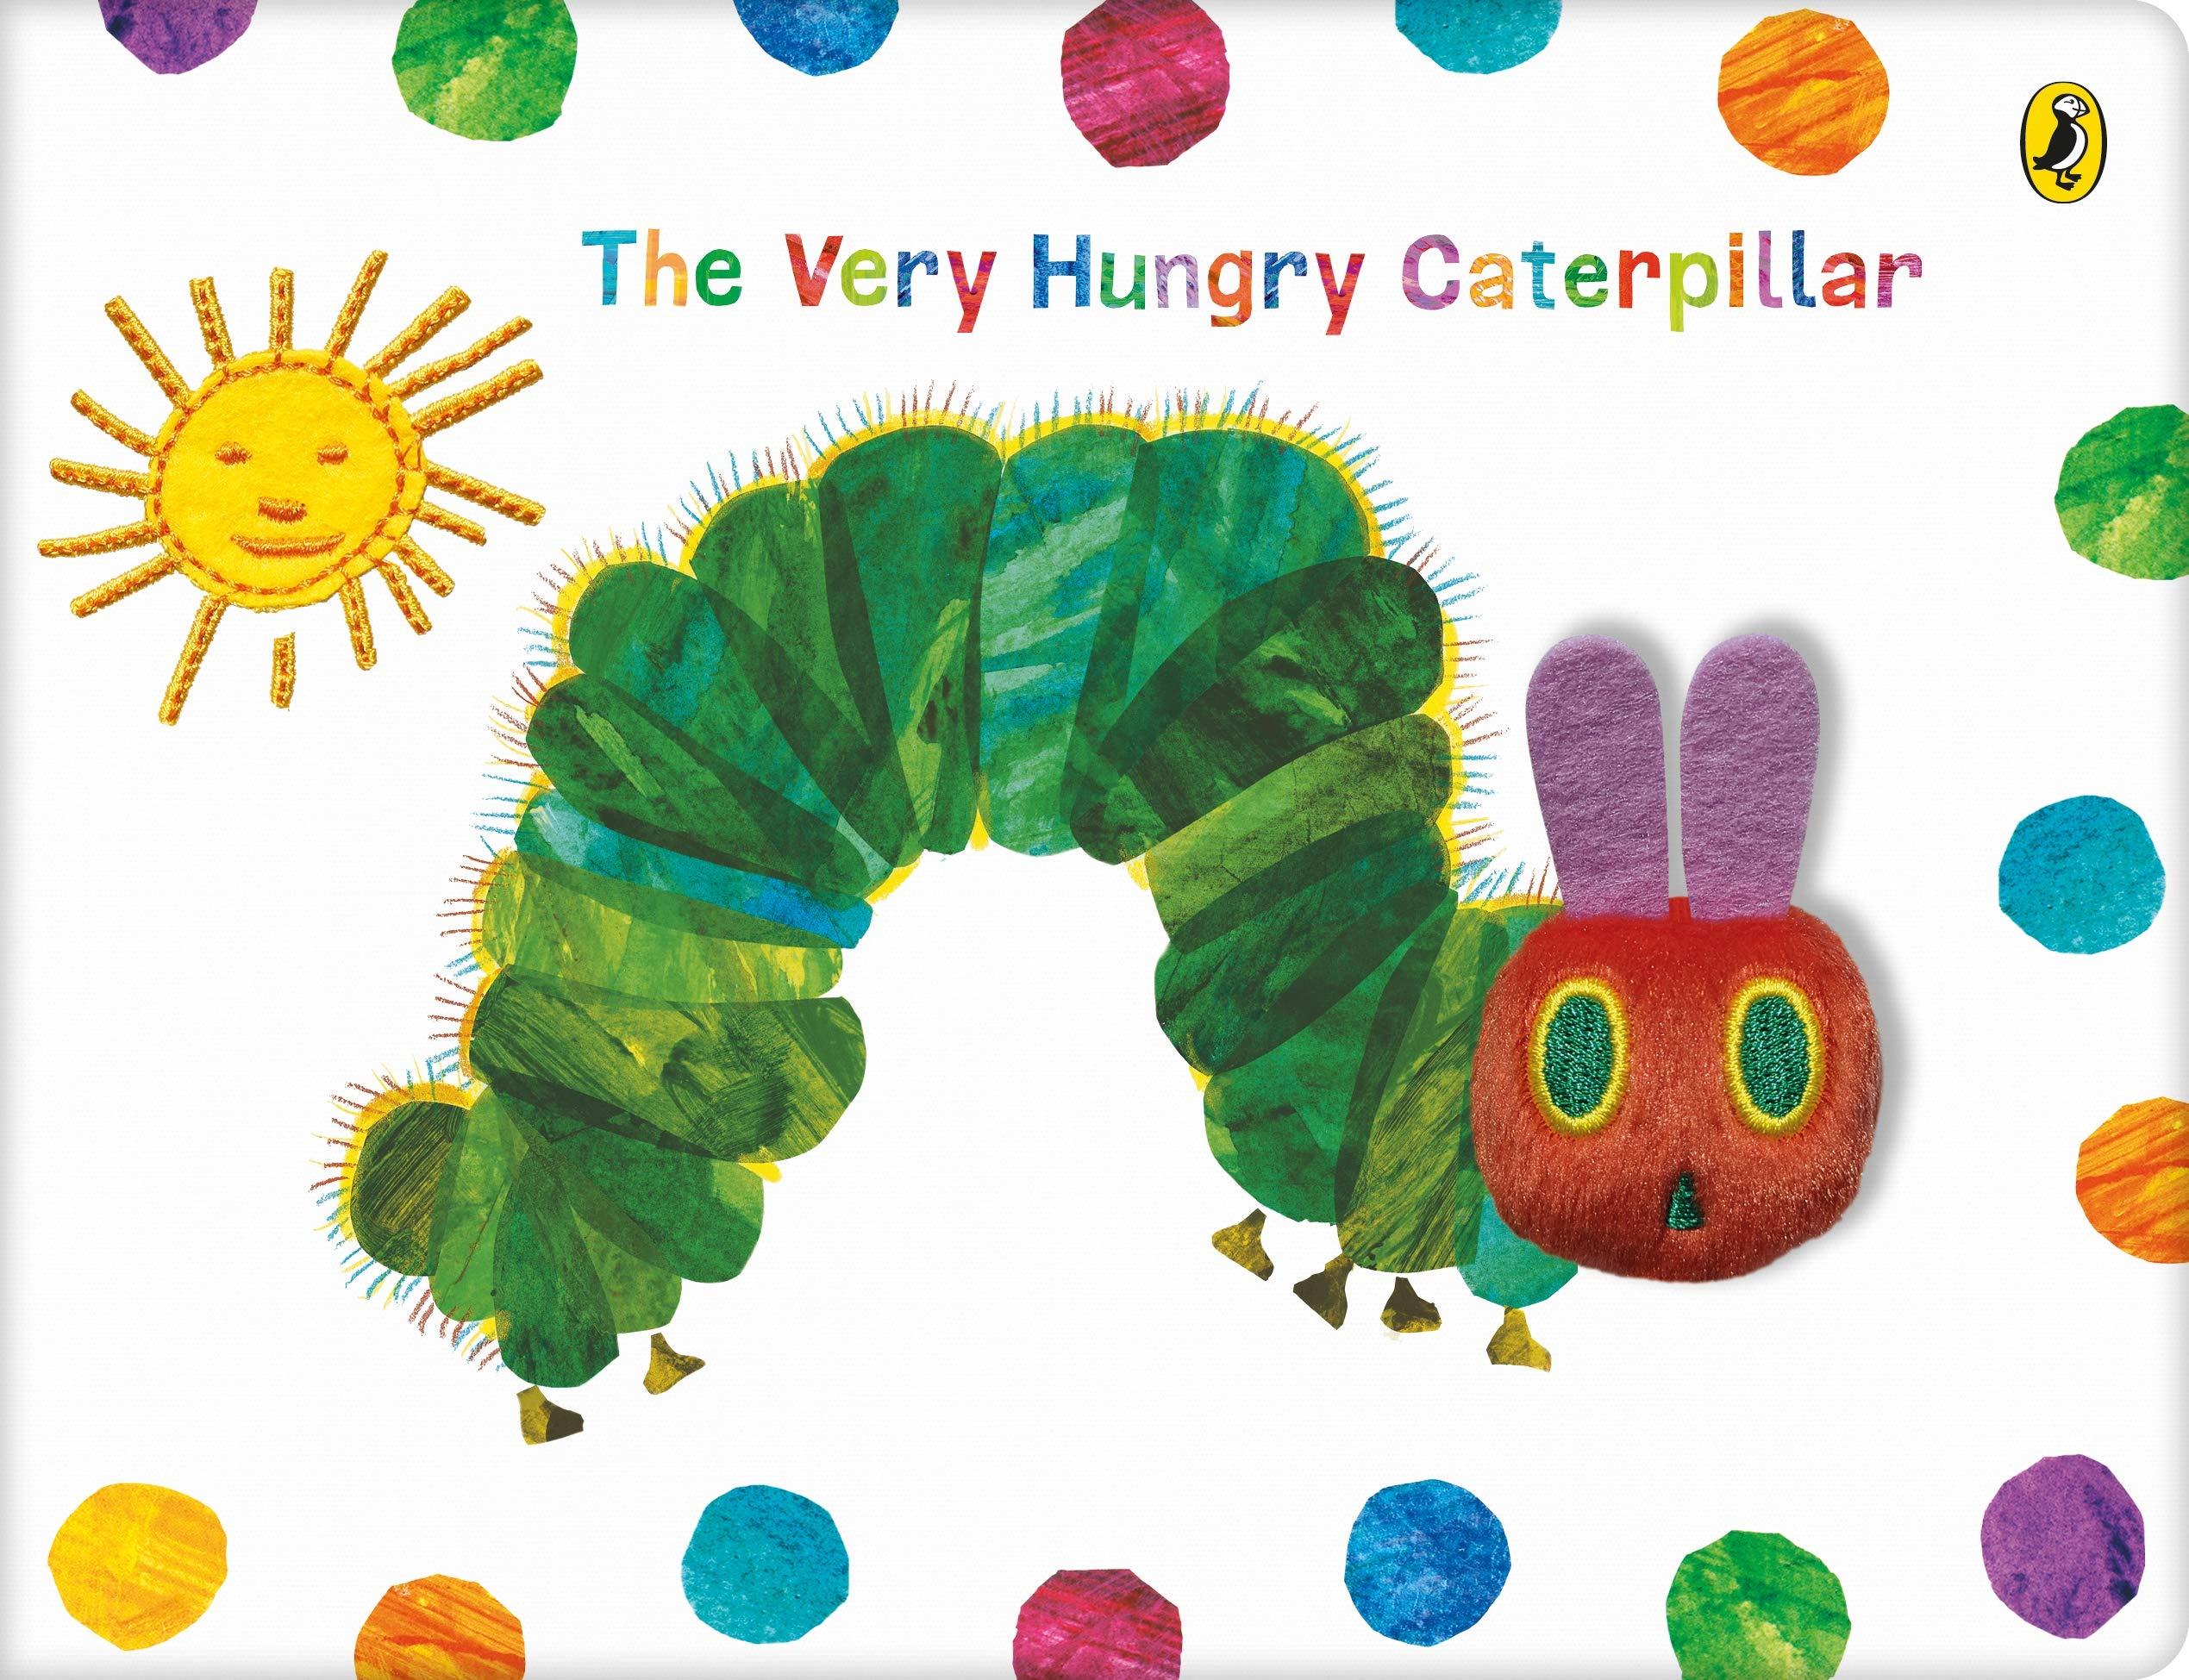 The Very Hungry Caterpillar Cloth Book  Carle, Eric Amazon.de ...